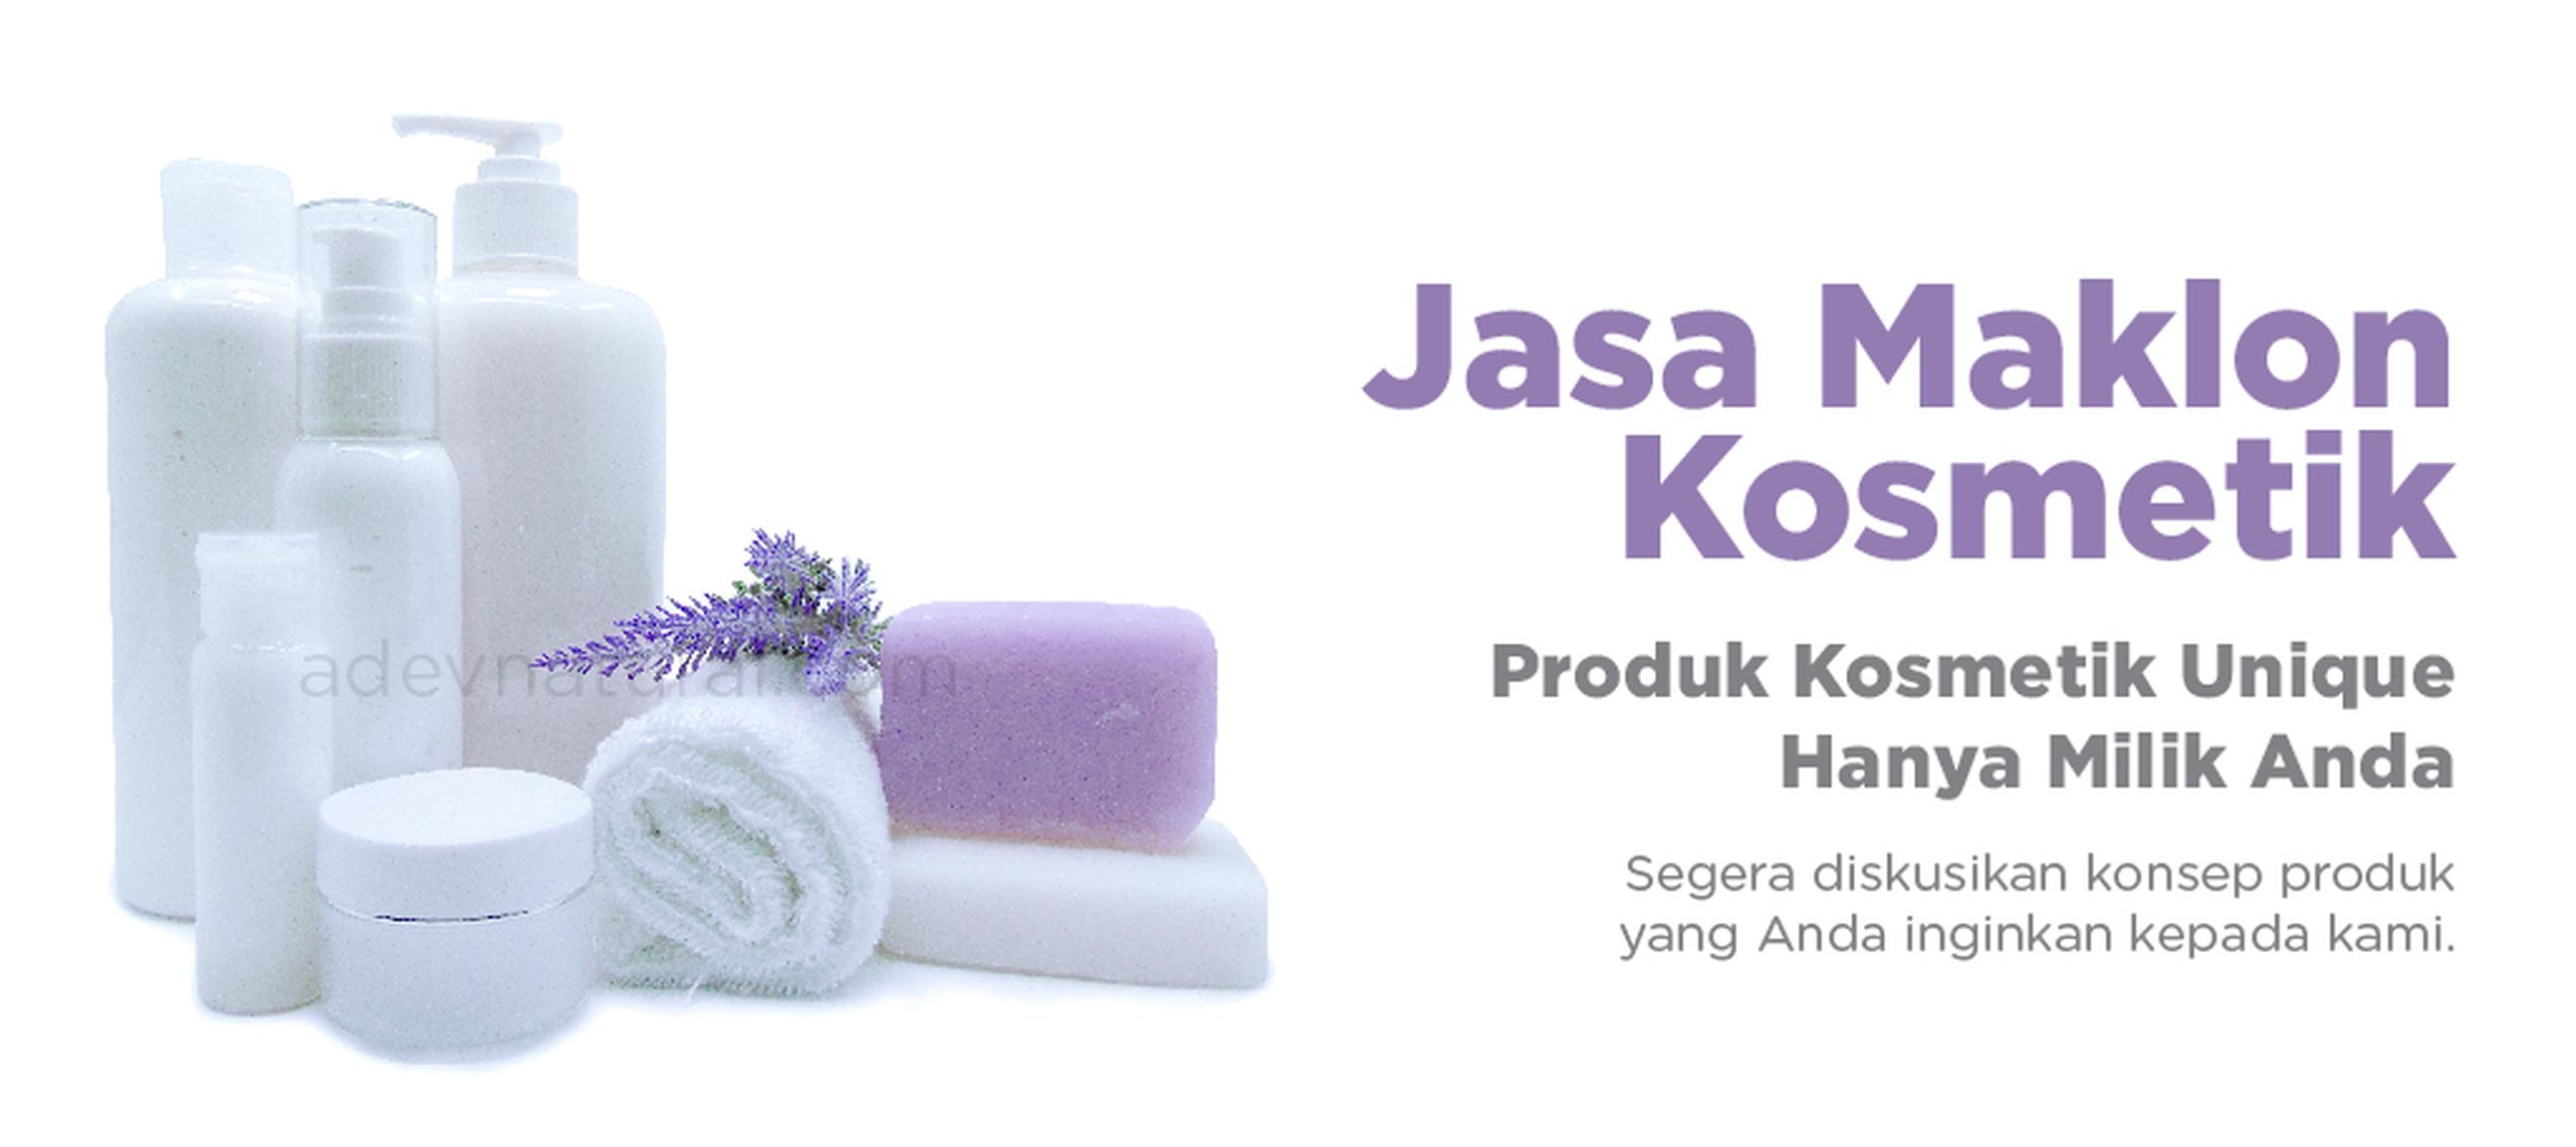 perusahaan maklon kosmetik terbaik di Bandung Indonesia